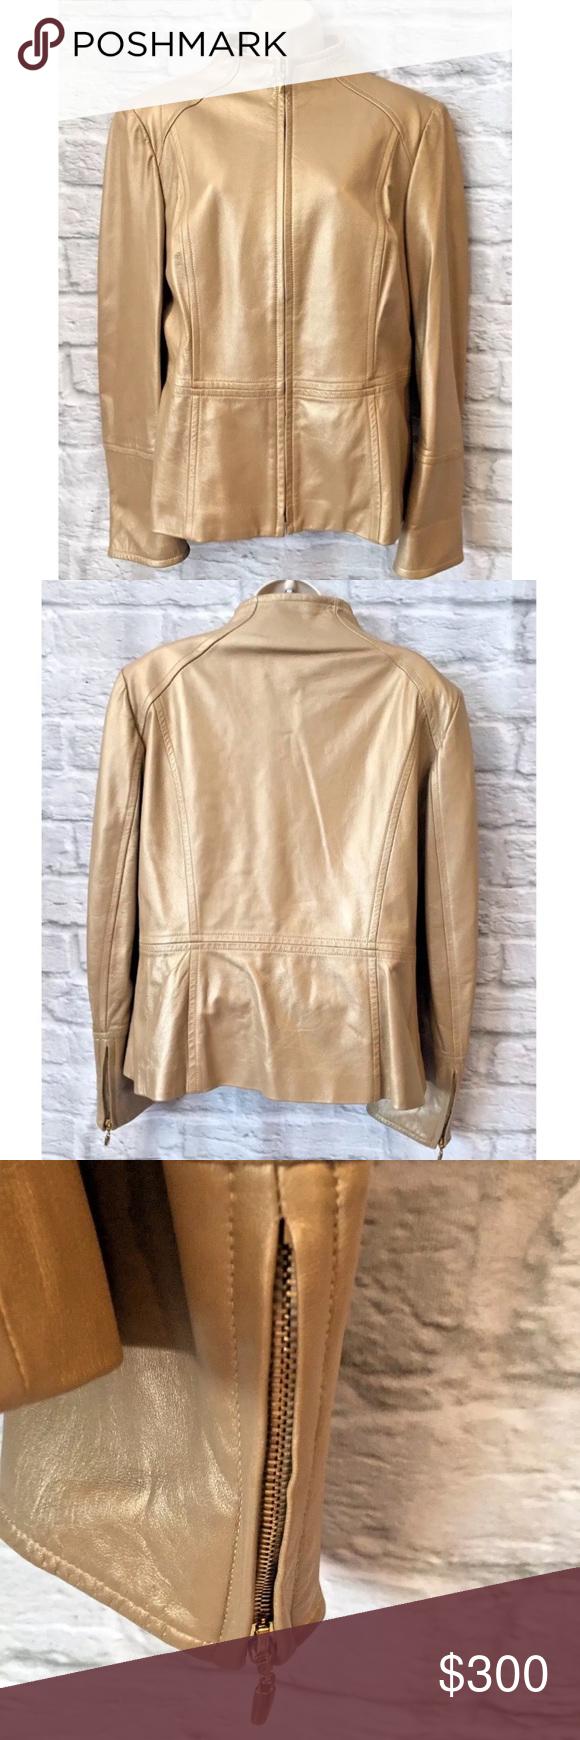 St John Sz L Gold Lamb Leather Moto Zipper Jacket St John Women S Supple Gold Lambs Leather Moto Zip Jacket With Gold Zipp Zipper Jacket Clothes Design Jackets [ 1740 x 580 Pixel ]